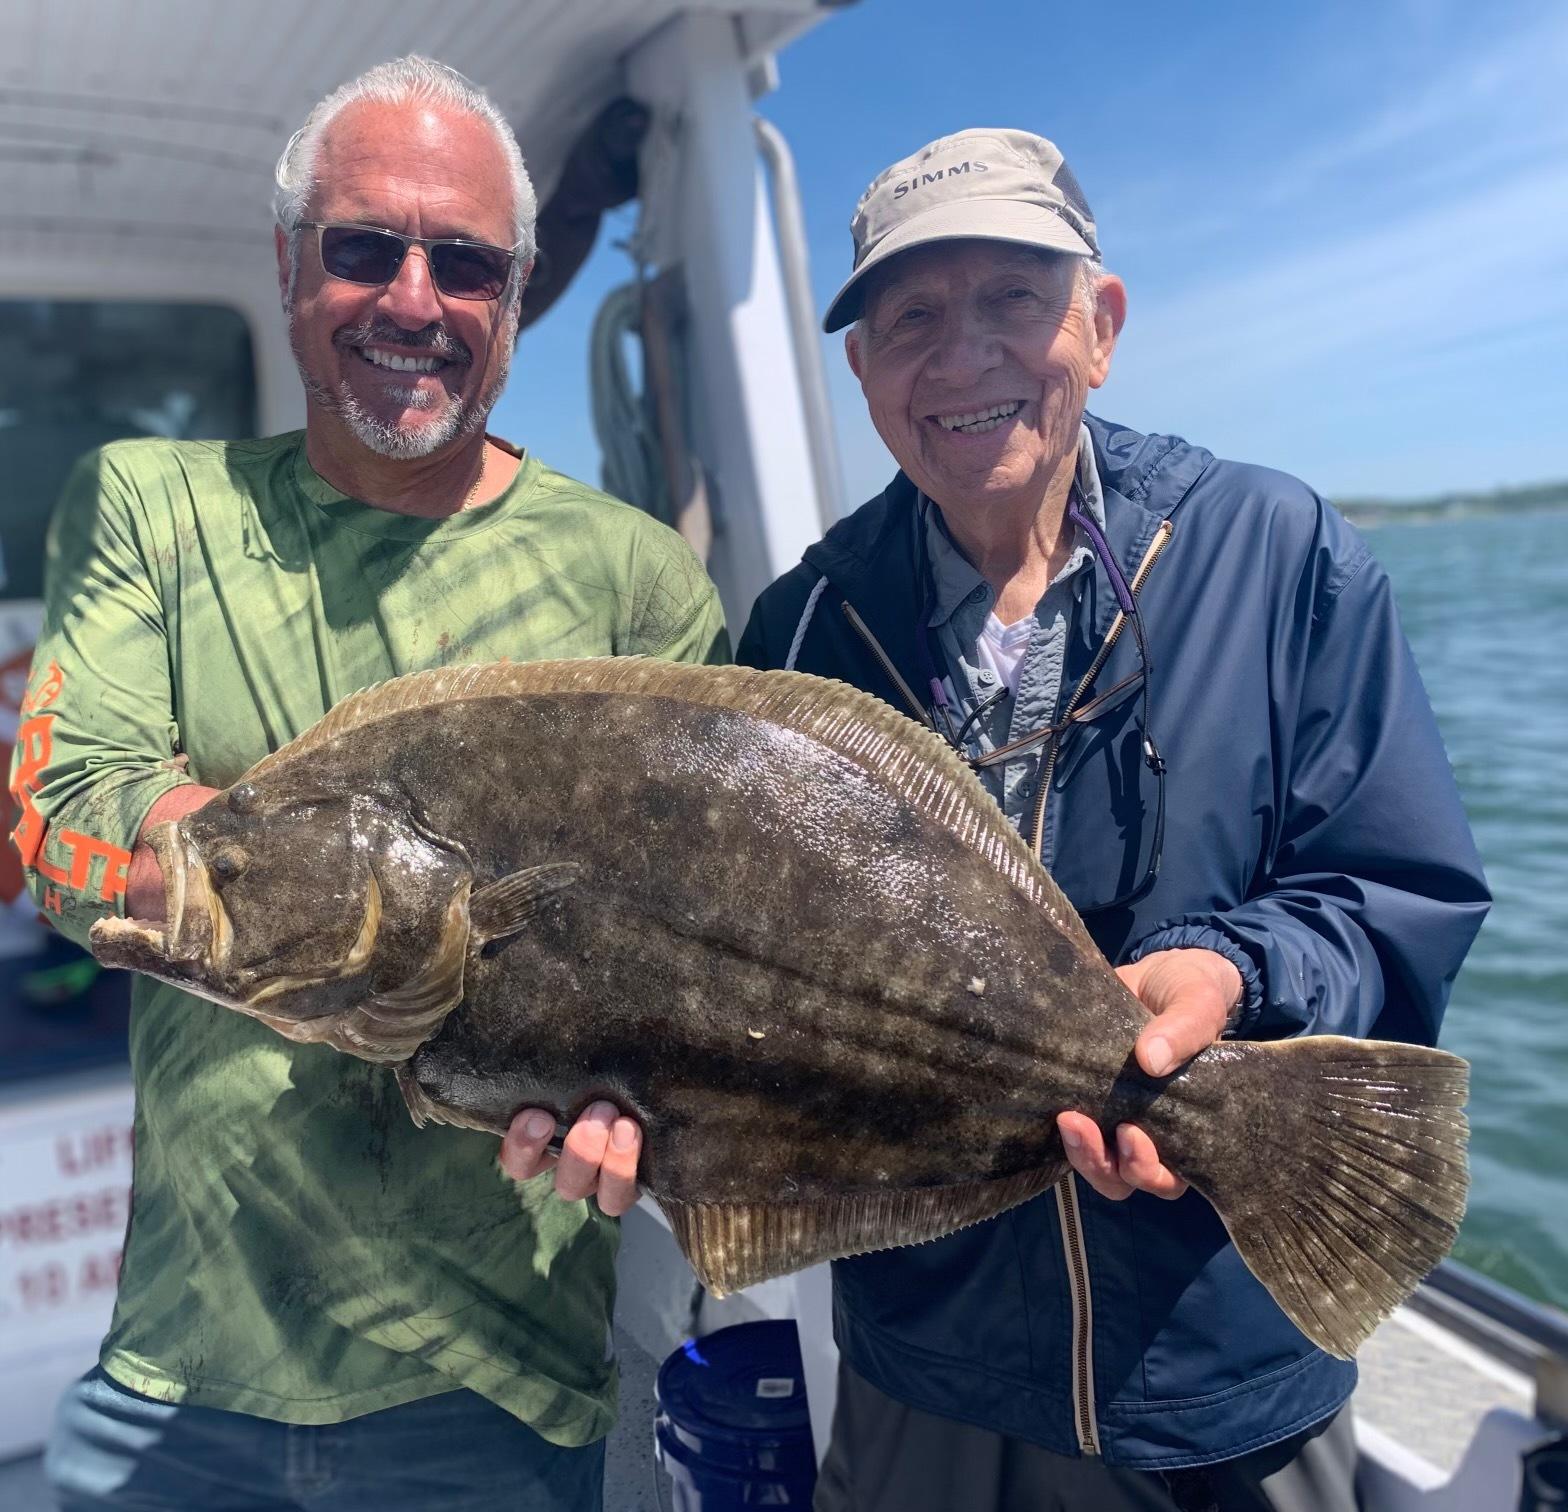 Capt. John Capuano helps Stan Kestenbaum show of the 10-pound 8-ounce fluke he caught aboard the Shinnecock Star last month.